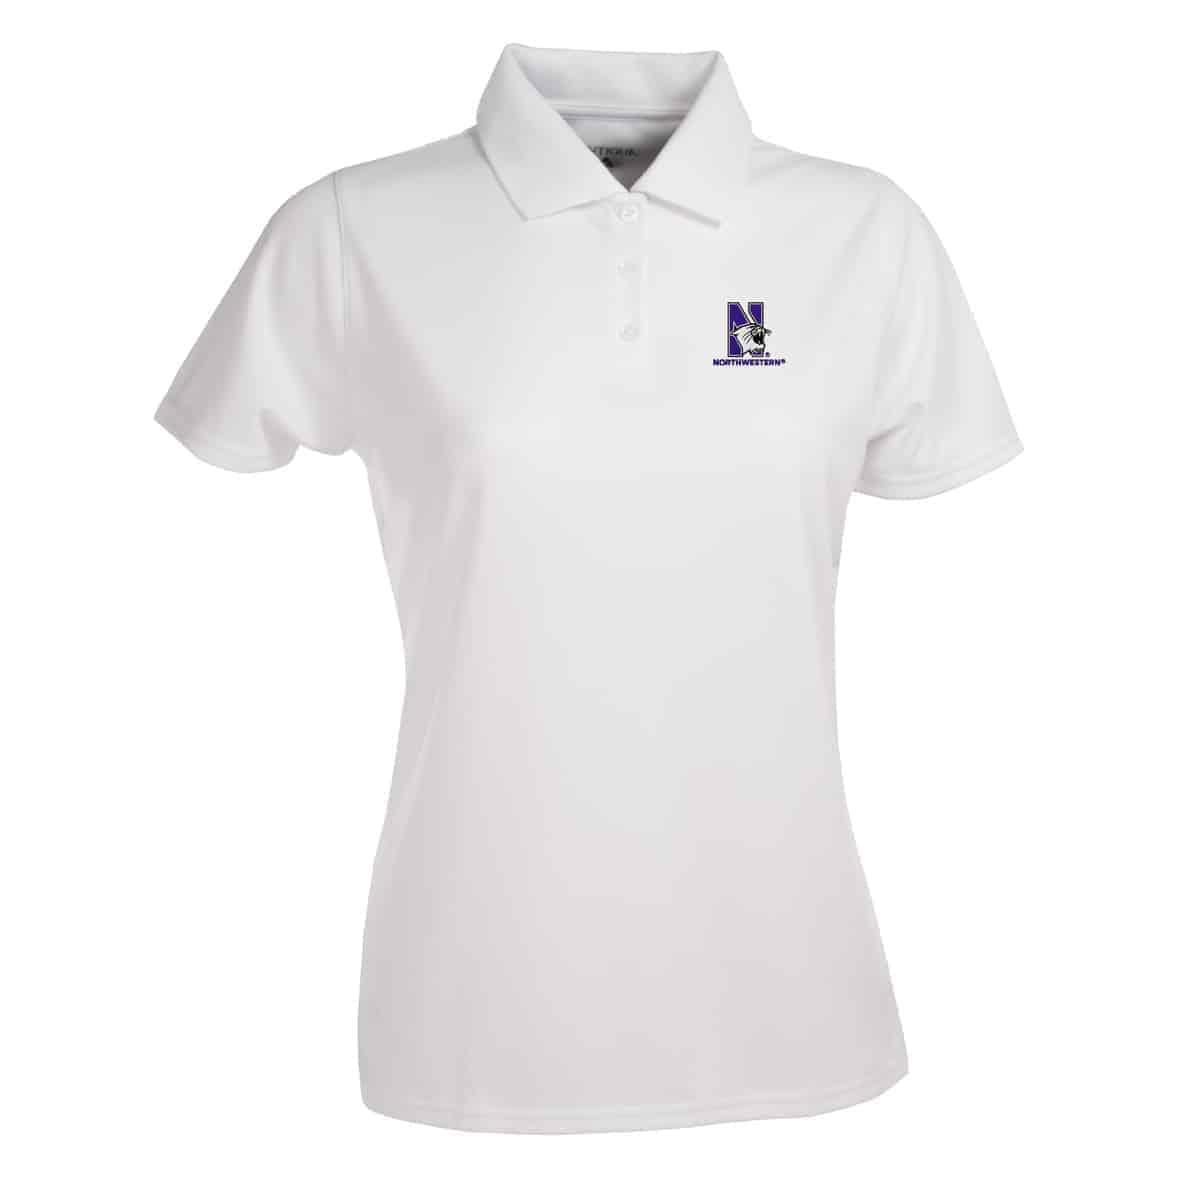 29bc5cc5 Northwestern Widcats Antigua Women's White Polo Shirt Women's Exceed 100224